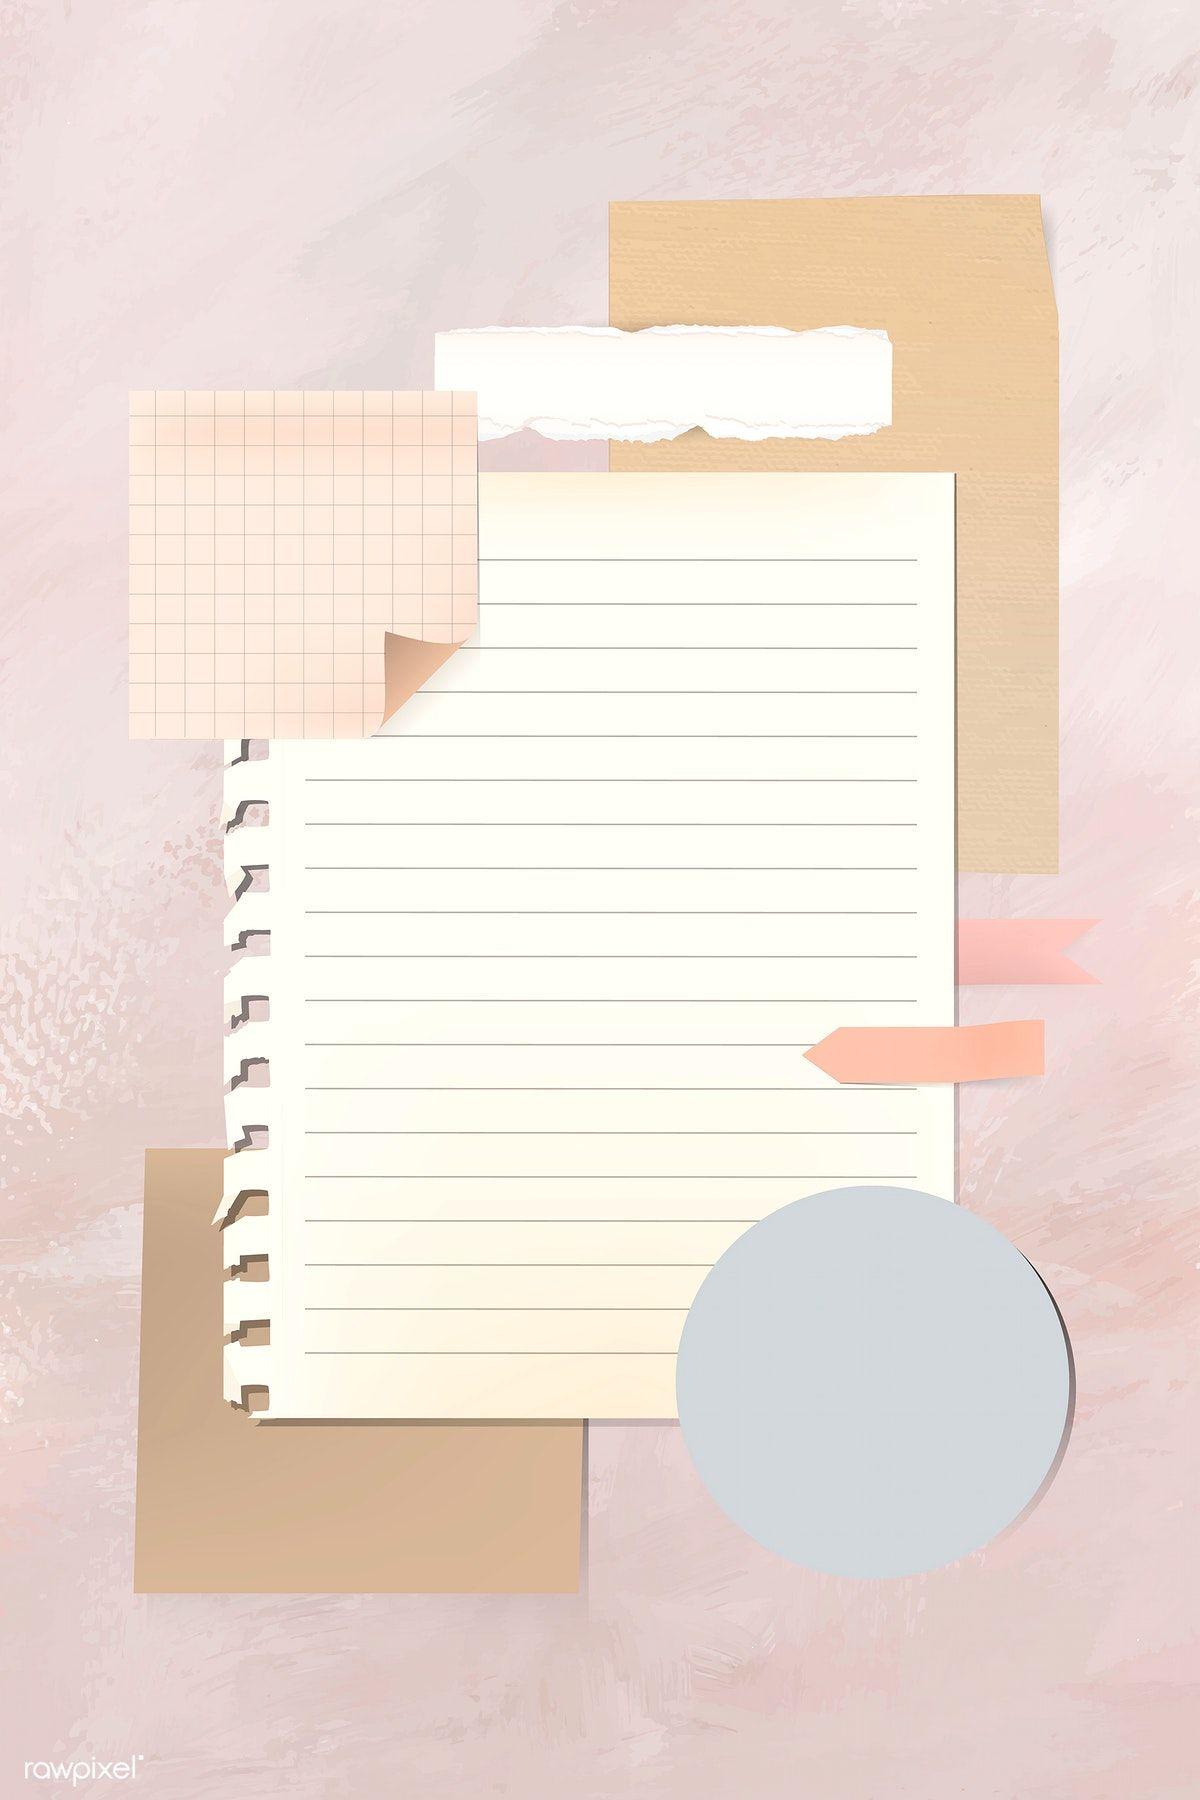 Download Premium Vector Of Blank Vintage Note Paper Template Vector Note Paper Paper Template Paper Background Texture